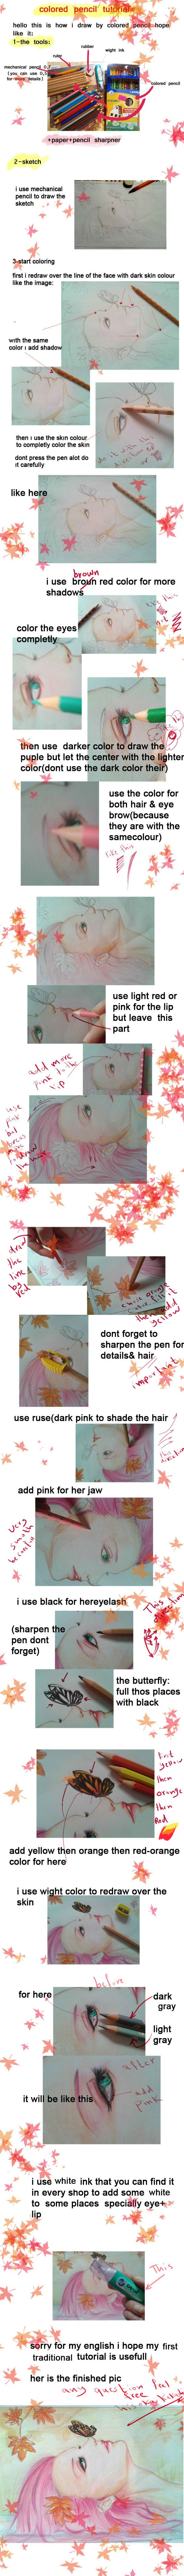 colored pencil tutorial by hisokakakashi.deviantart.com (broken English aside, very nice tutorial!)